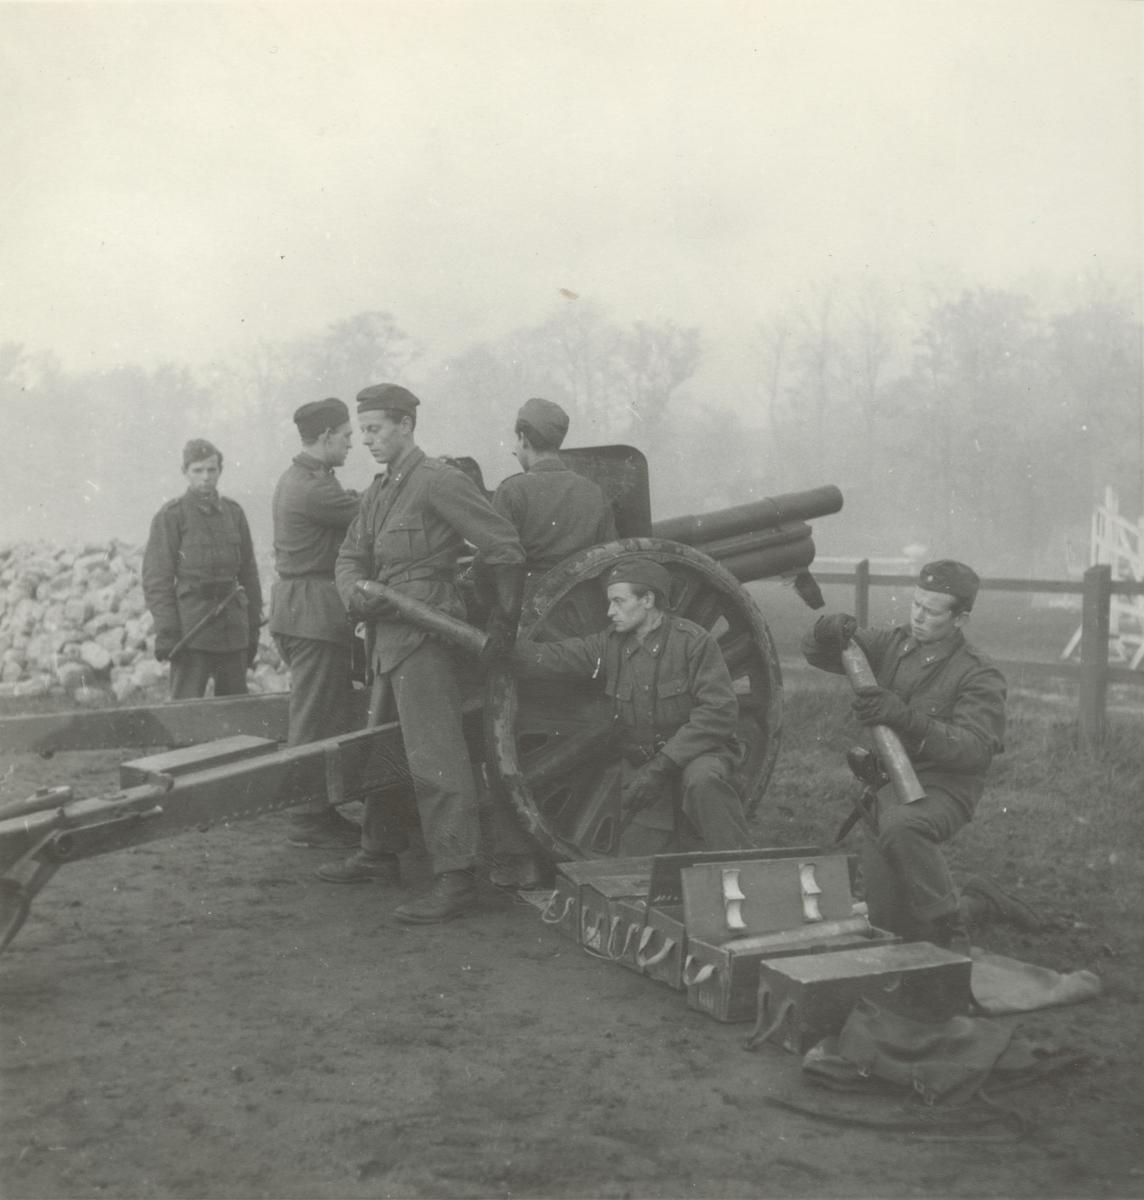 Pjäsexercis med 7,5 cm kanon m/1902-33, Svea artilleriregemente A 1, våren 1947.